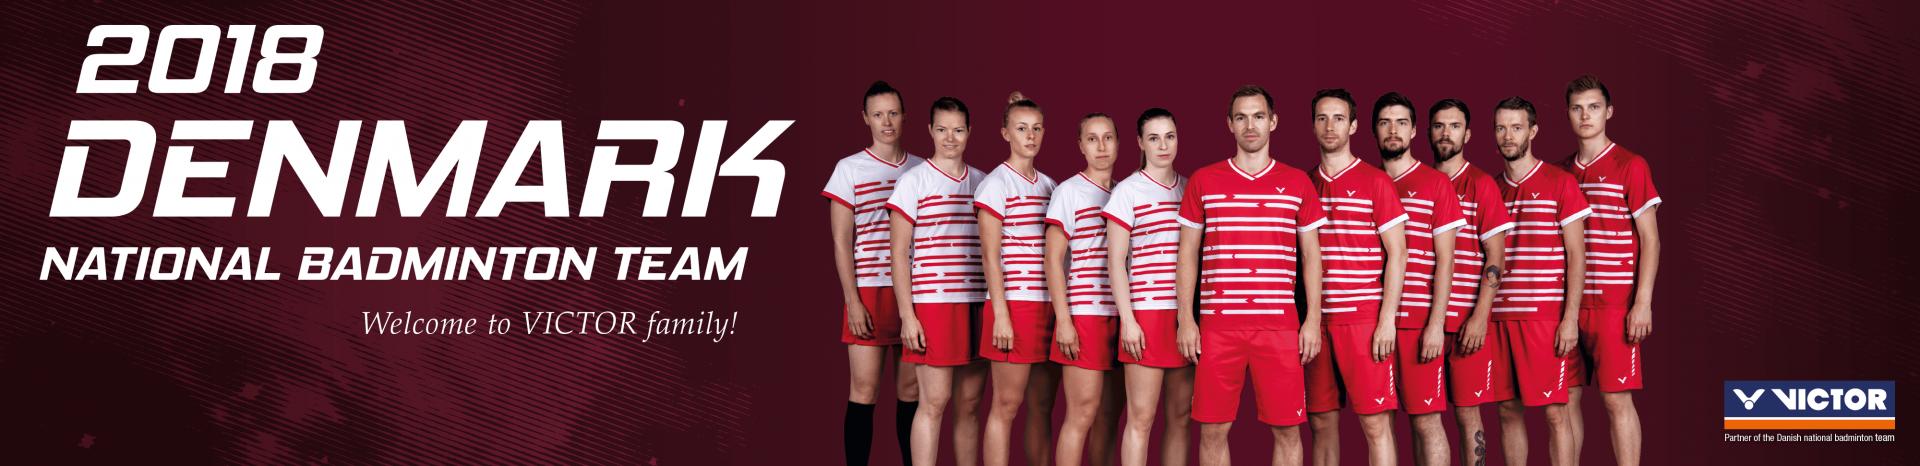 Denmark National Teamwear players